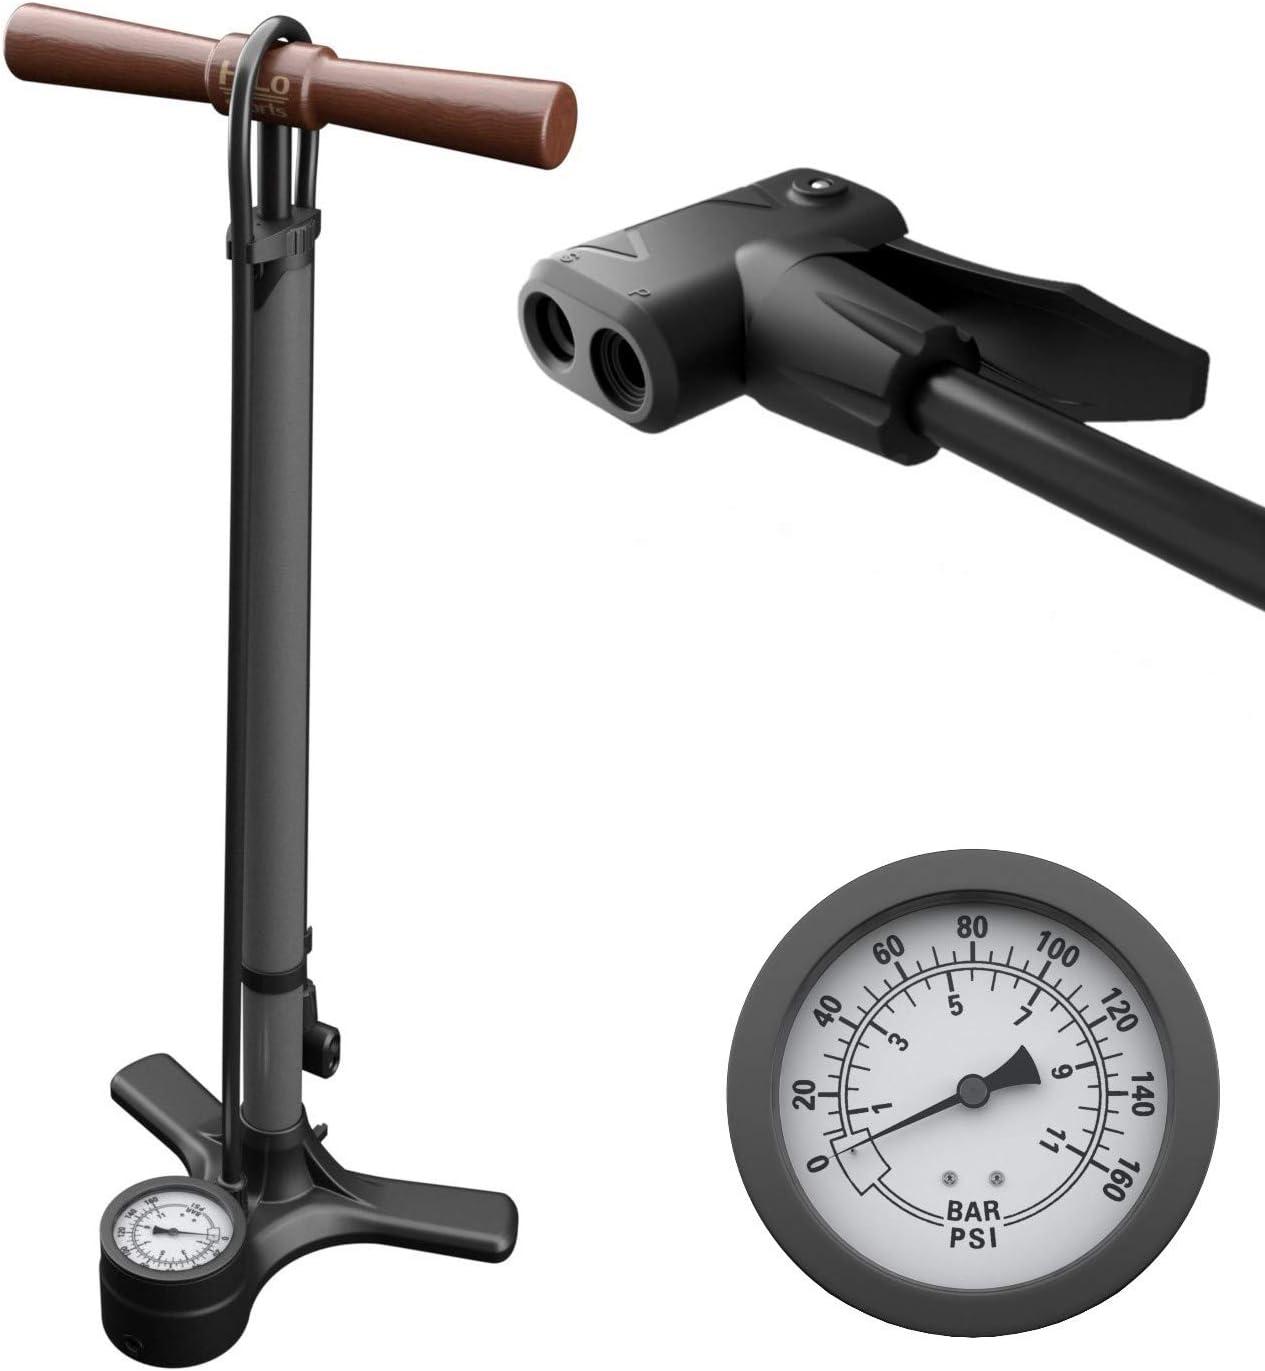 120psi Fahrradpumpe Standpumpe Hochdruck Luftpumpe Ballpumpe Passen alle Ventile